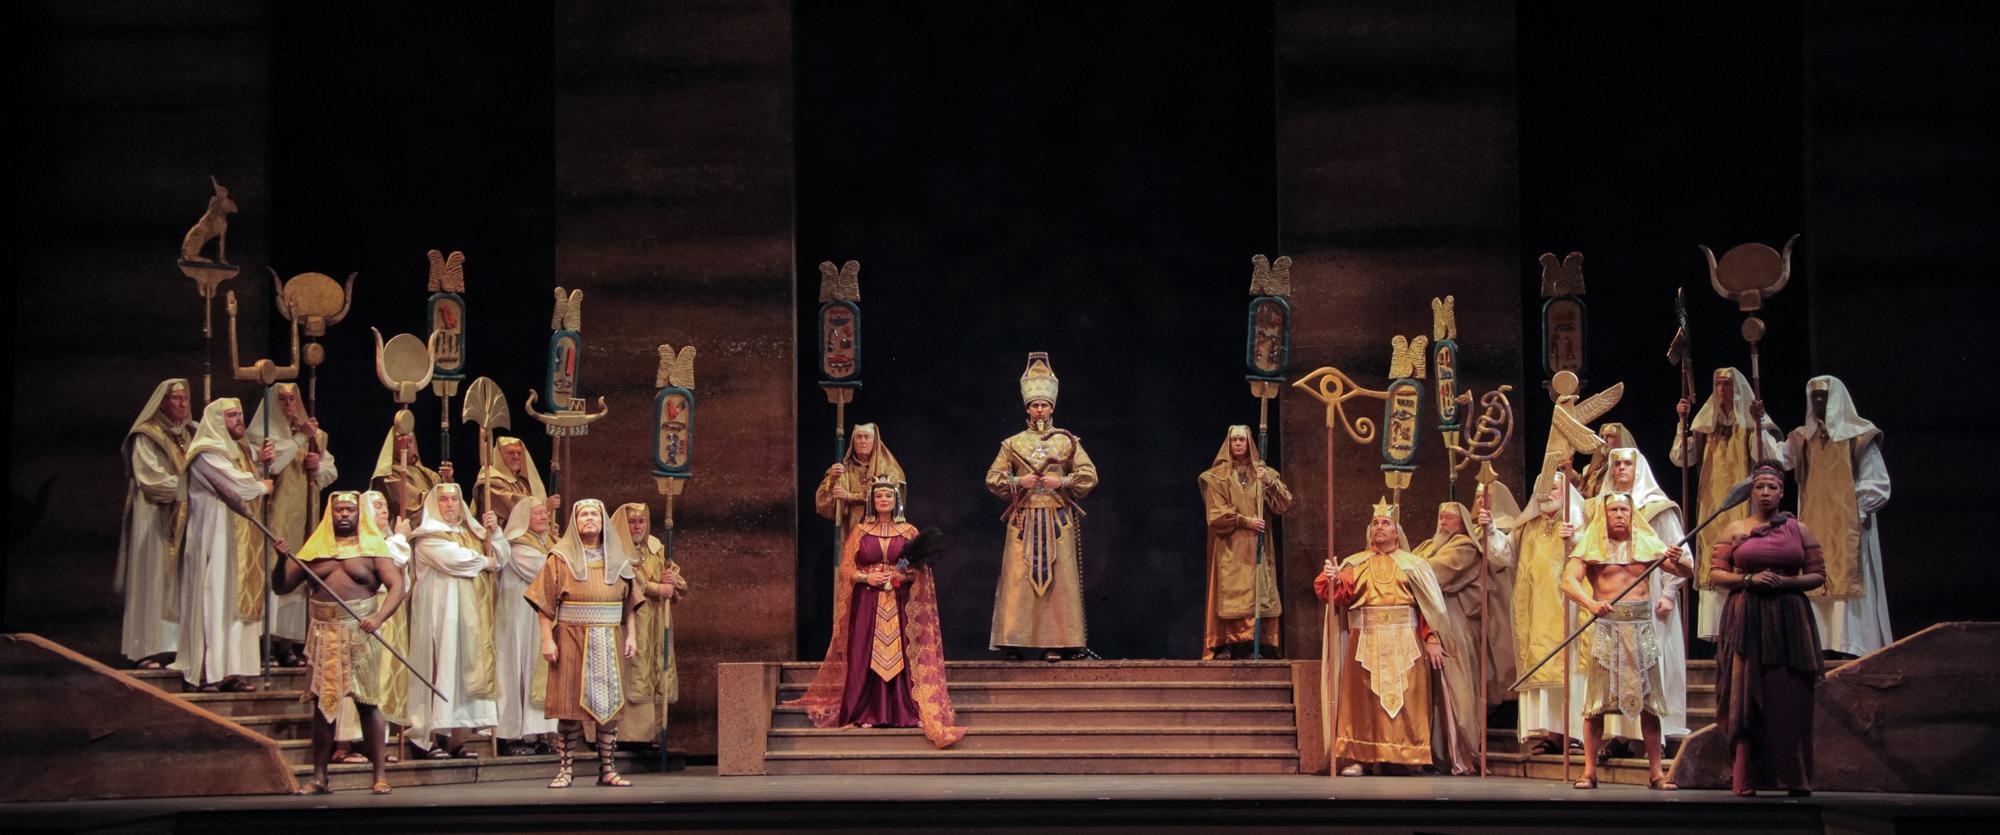 Aida-035.jpg